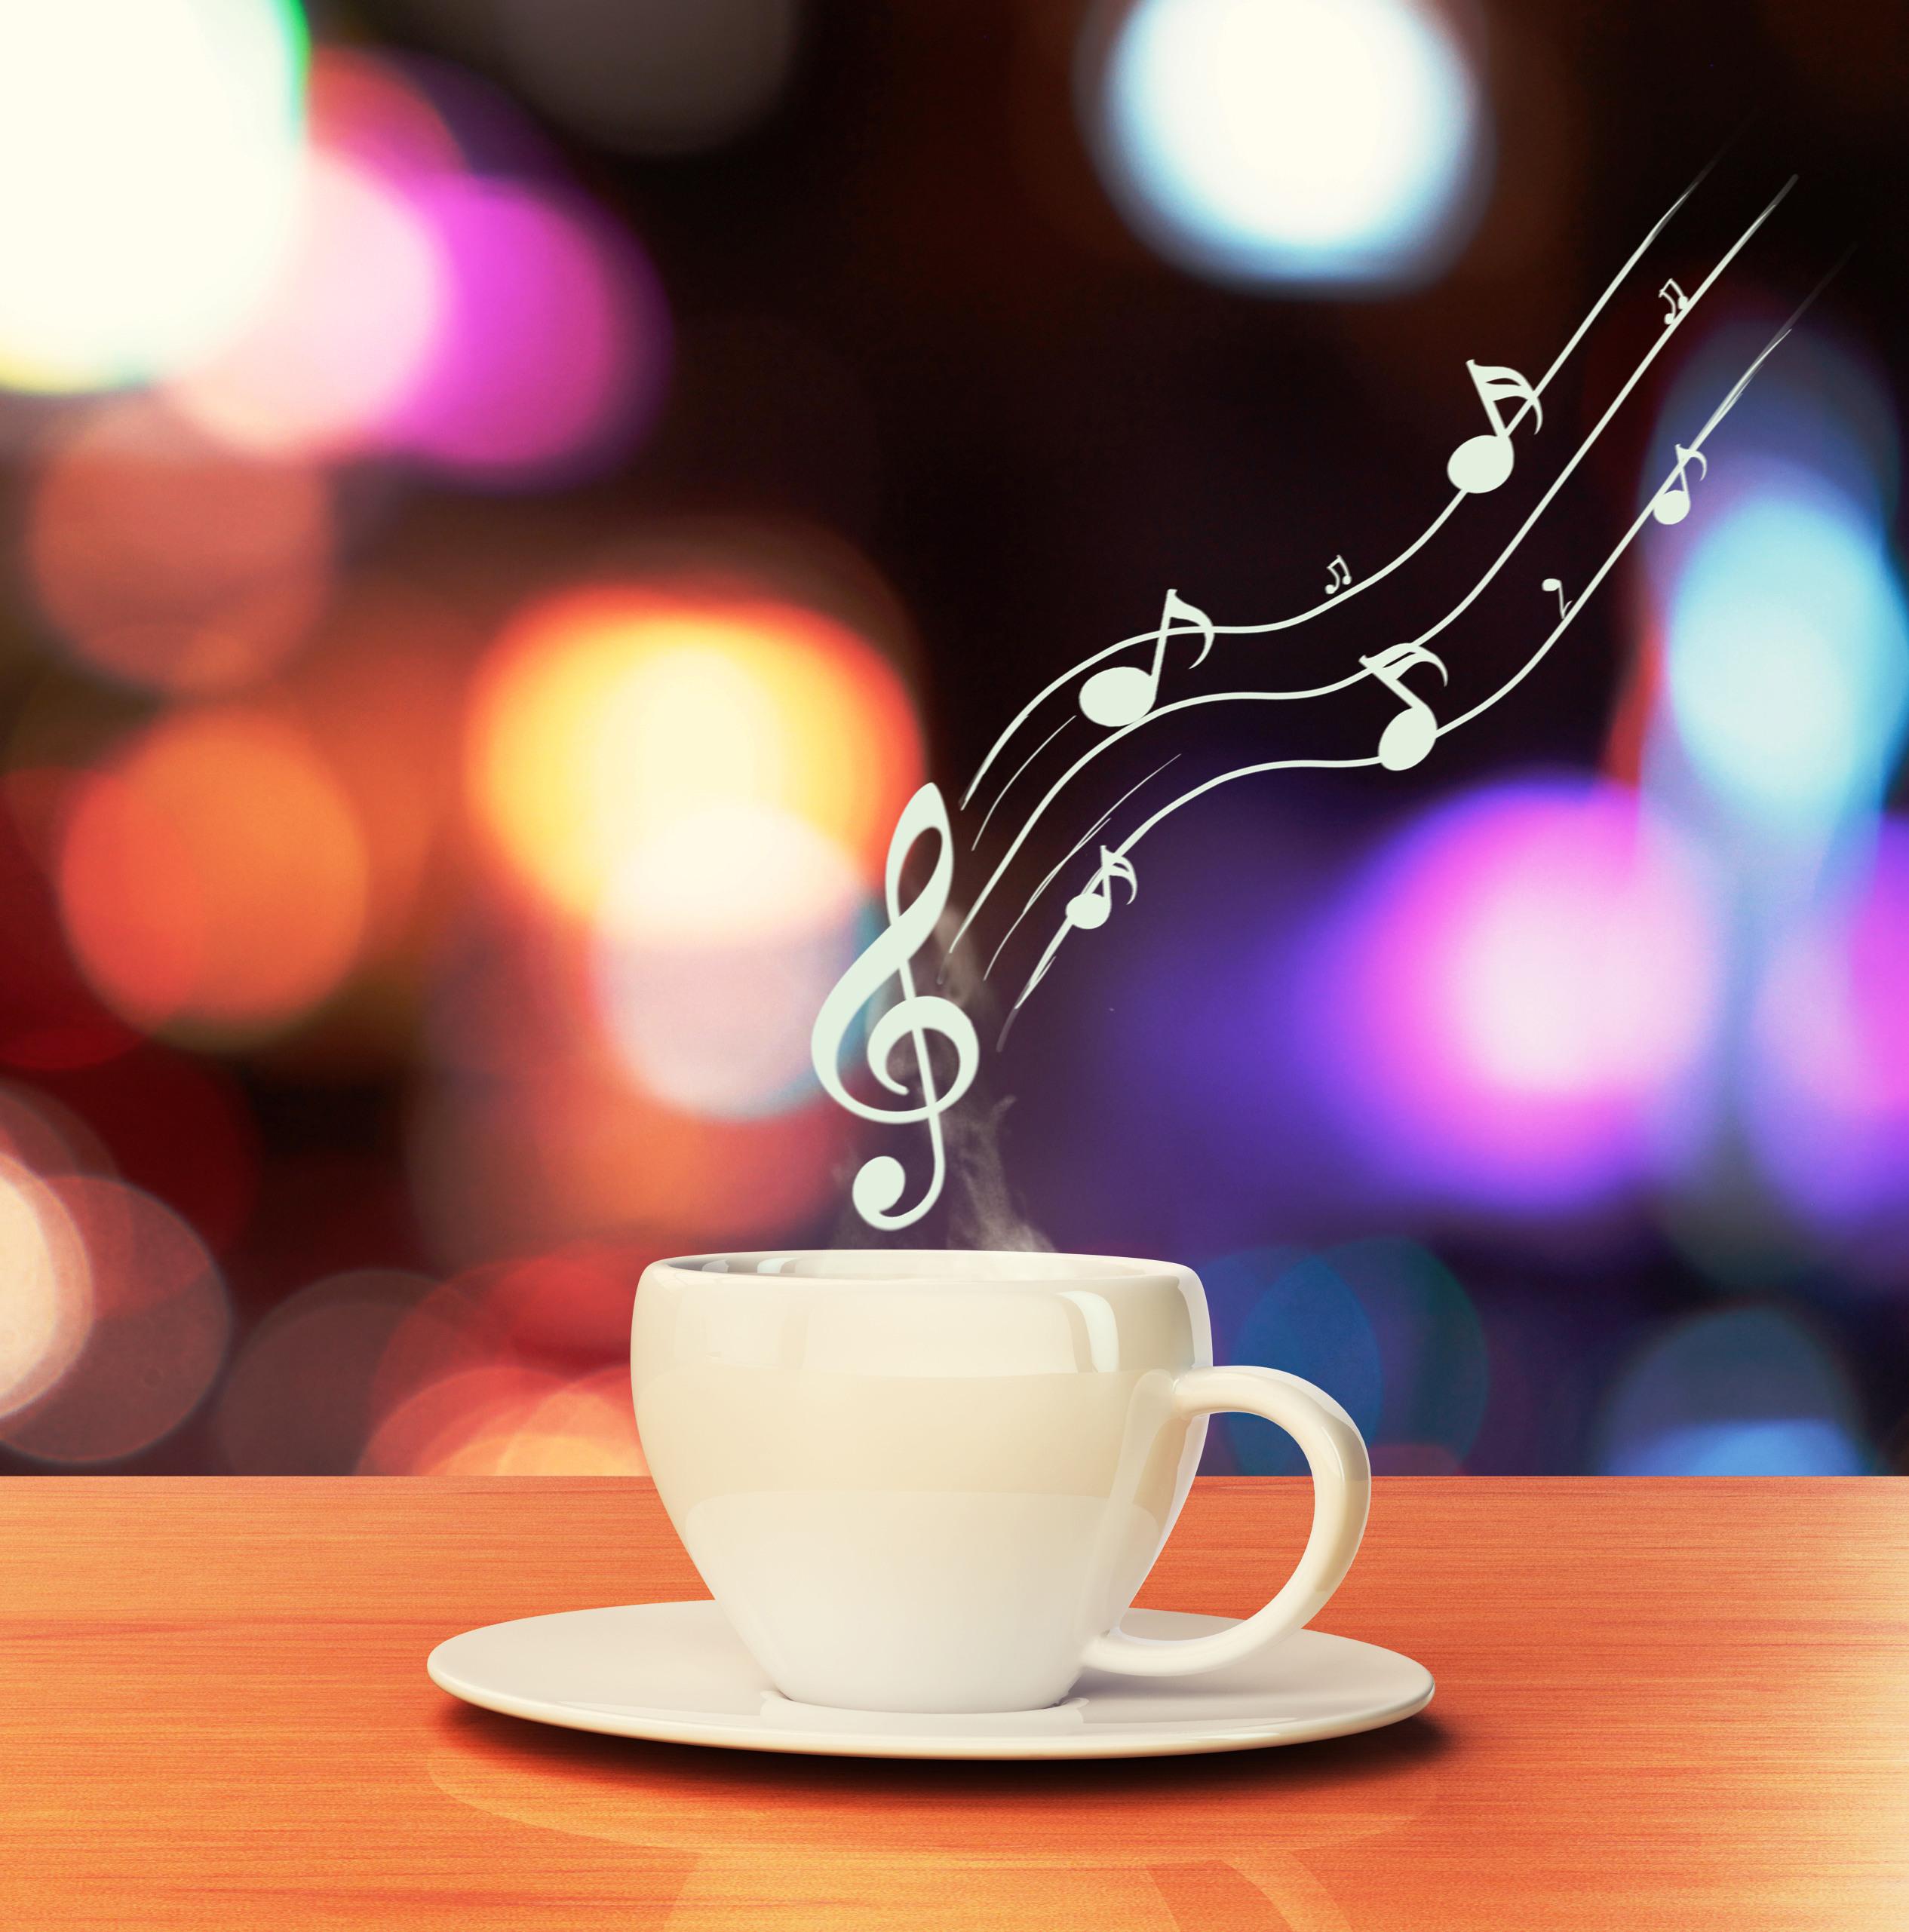 Музыка для кафе | Картинка на сайте